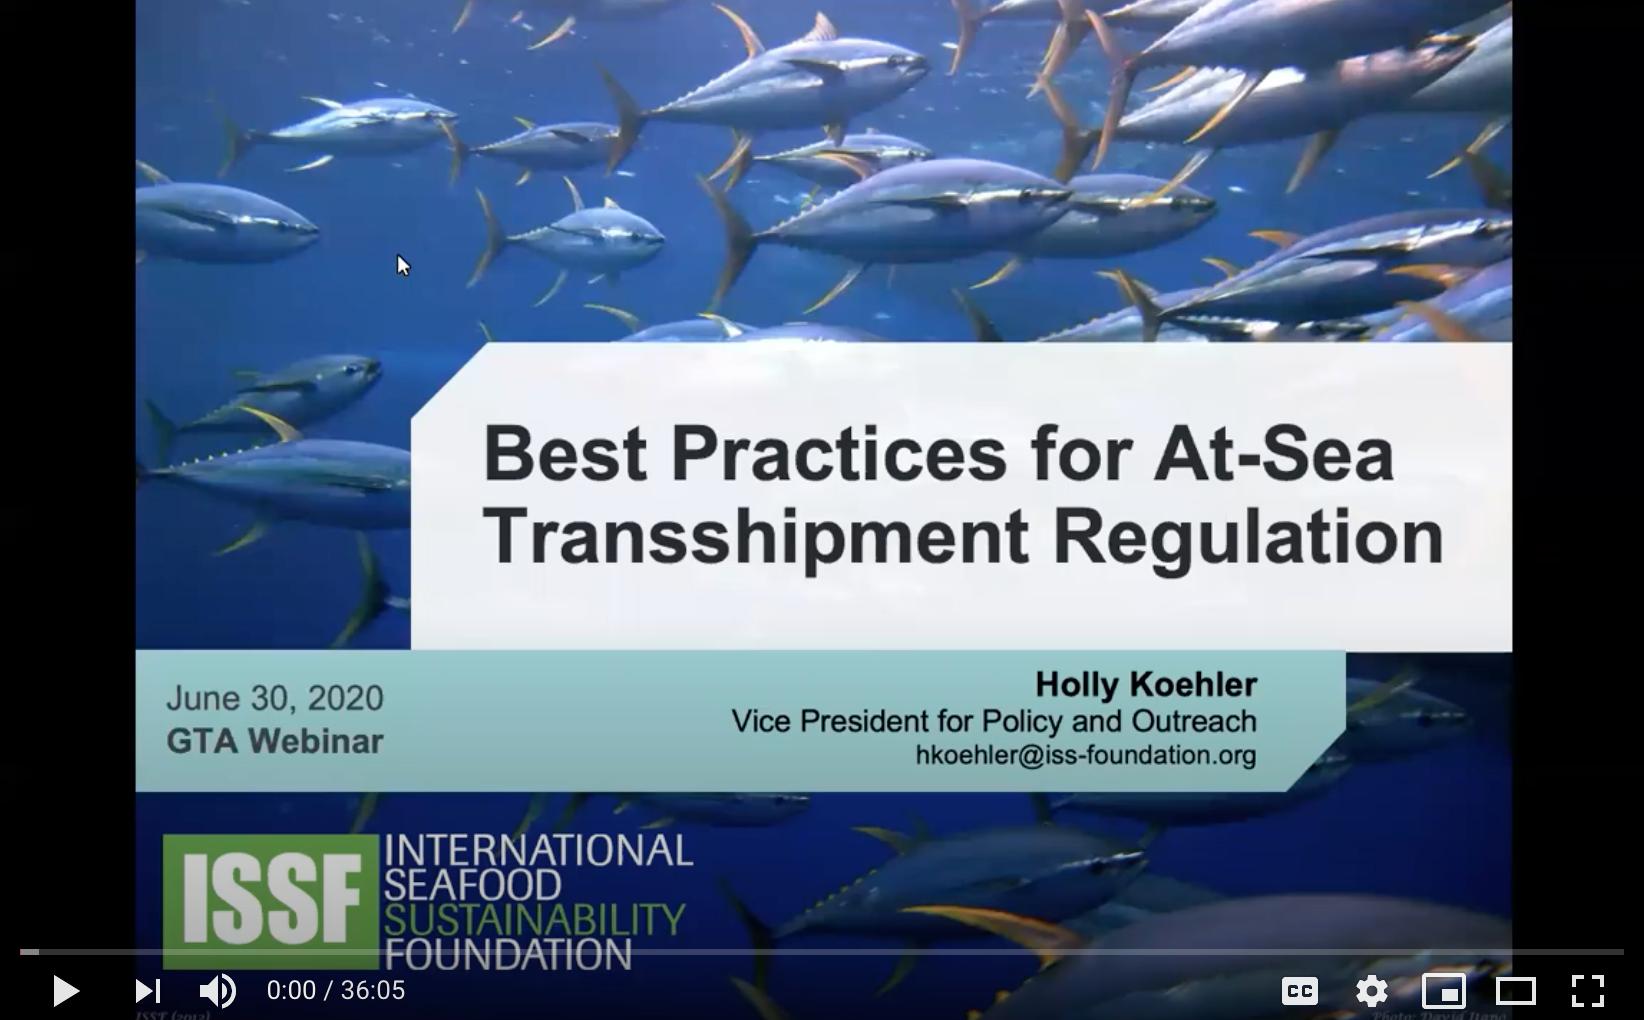 Transshipment Best Practices